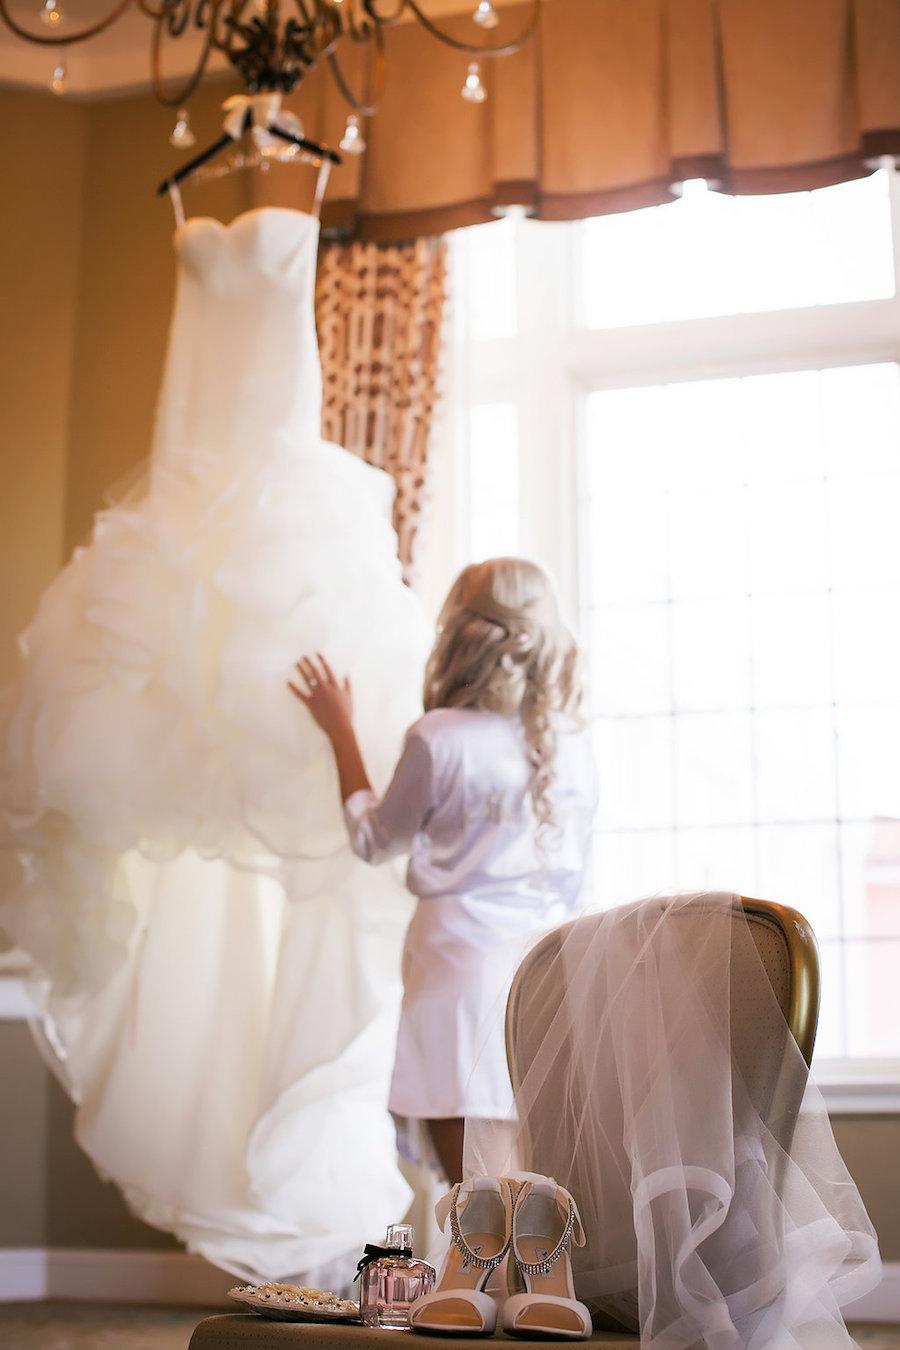 Bridal Getting Ready Wedding Portrait  Ivory Strapless Drop Waist Pronovias Wedding Dress   Pronovias Wedding Dress   Tampa Wedding Photographer Limelight Photography